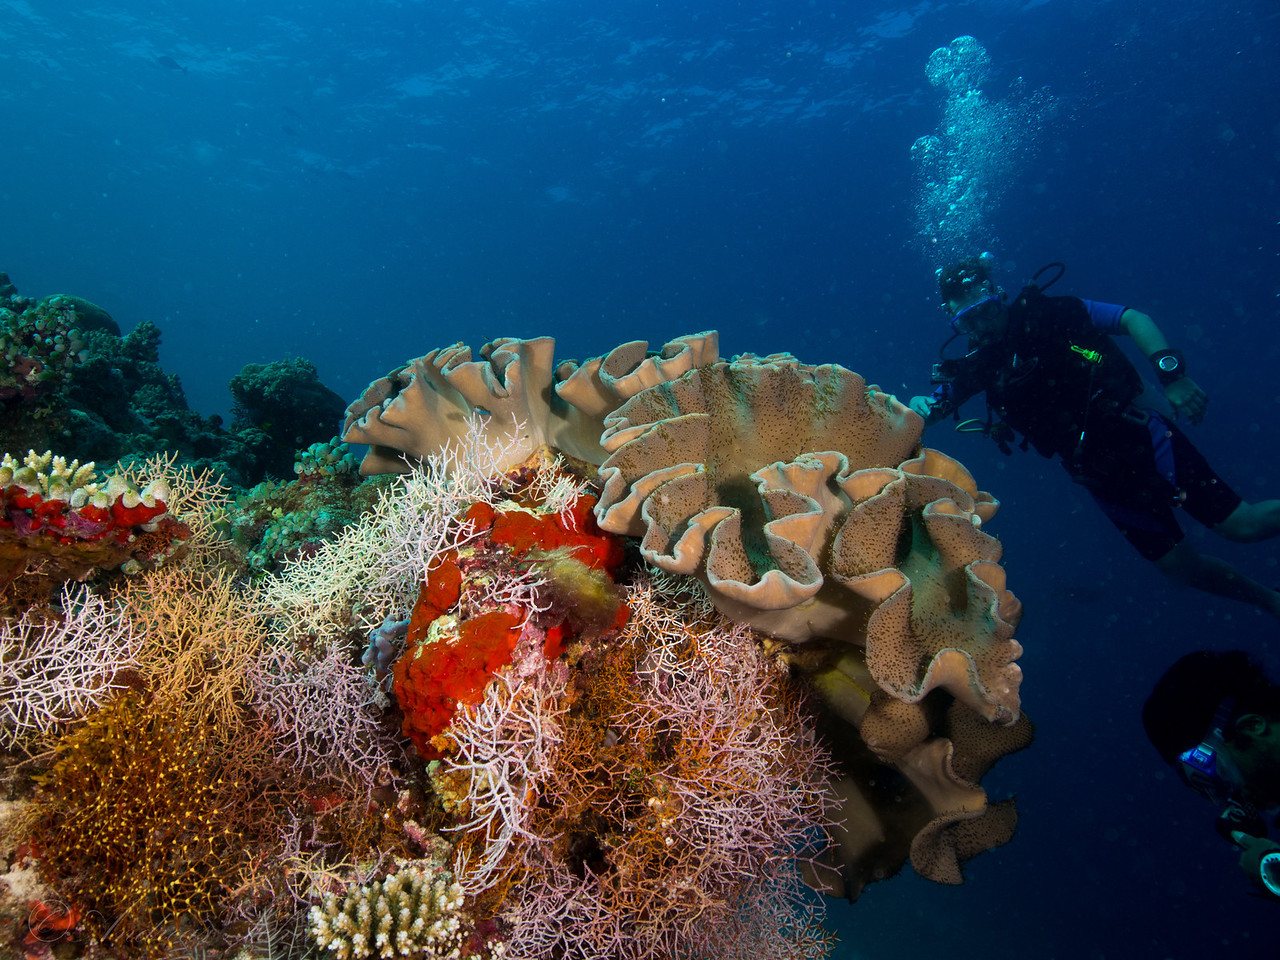 Leather coral, Maldives 2014